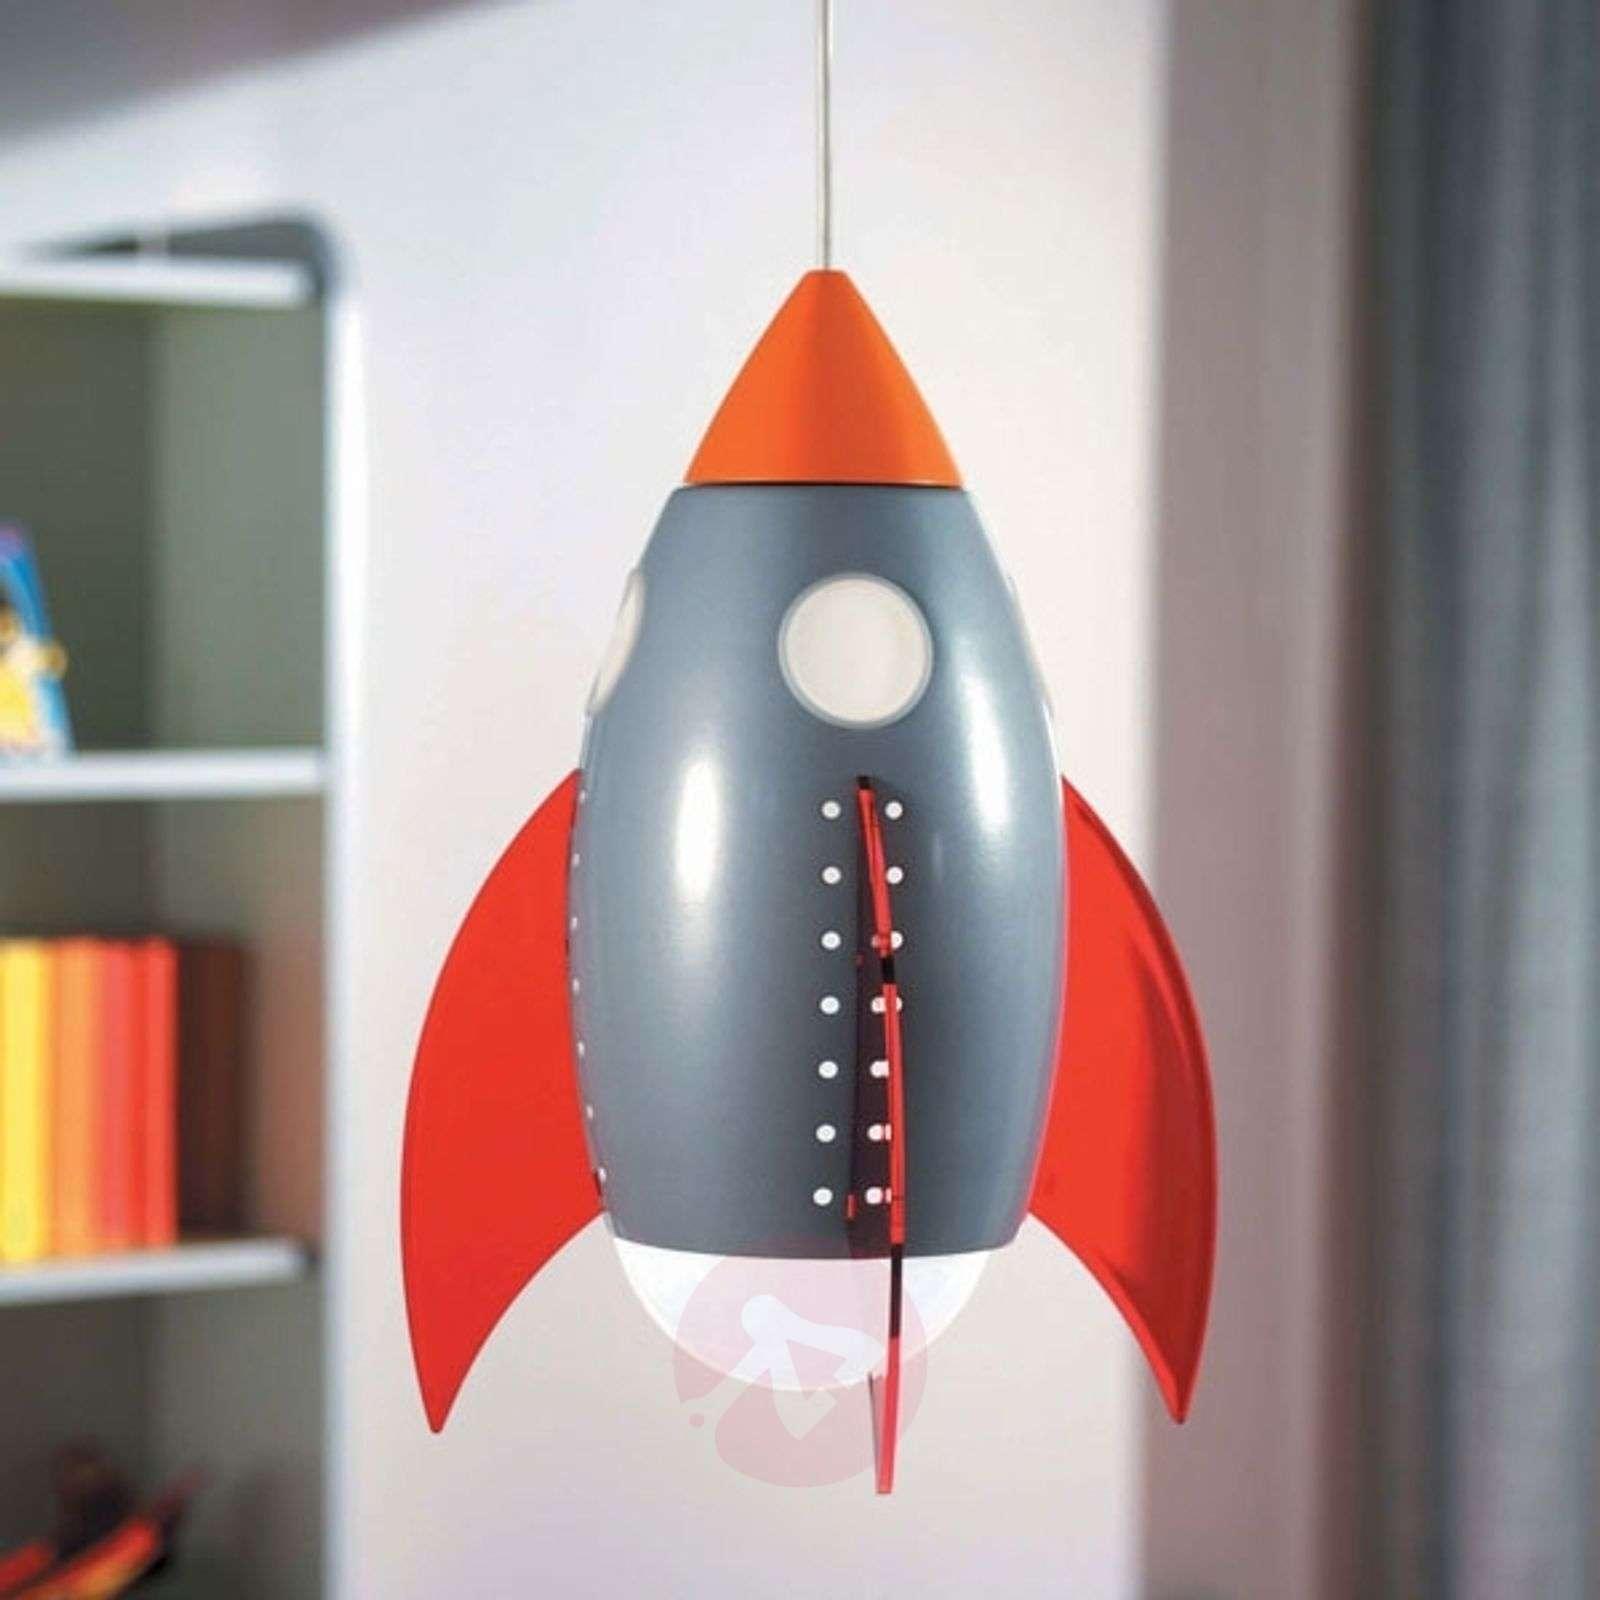 Childrens room pendant lamp ROCKY-6500602-01